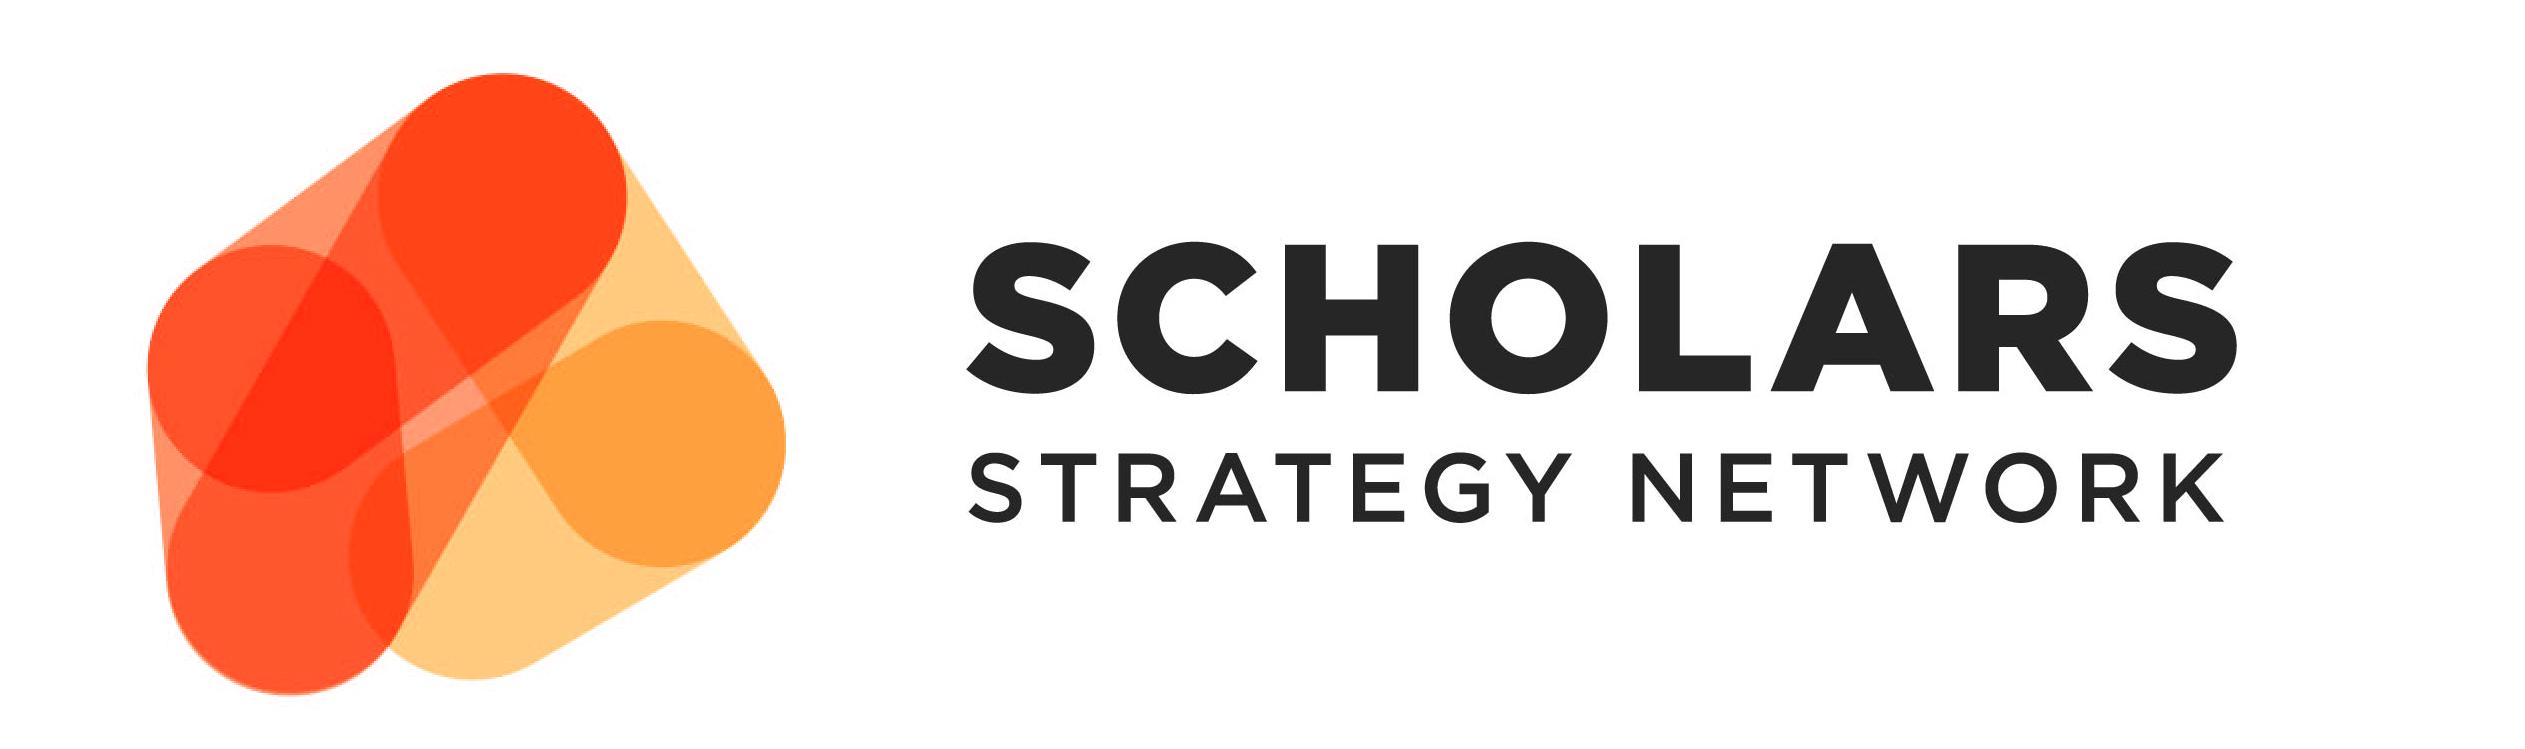 Scholars Strategy Network